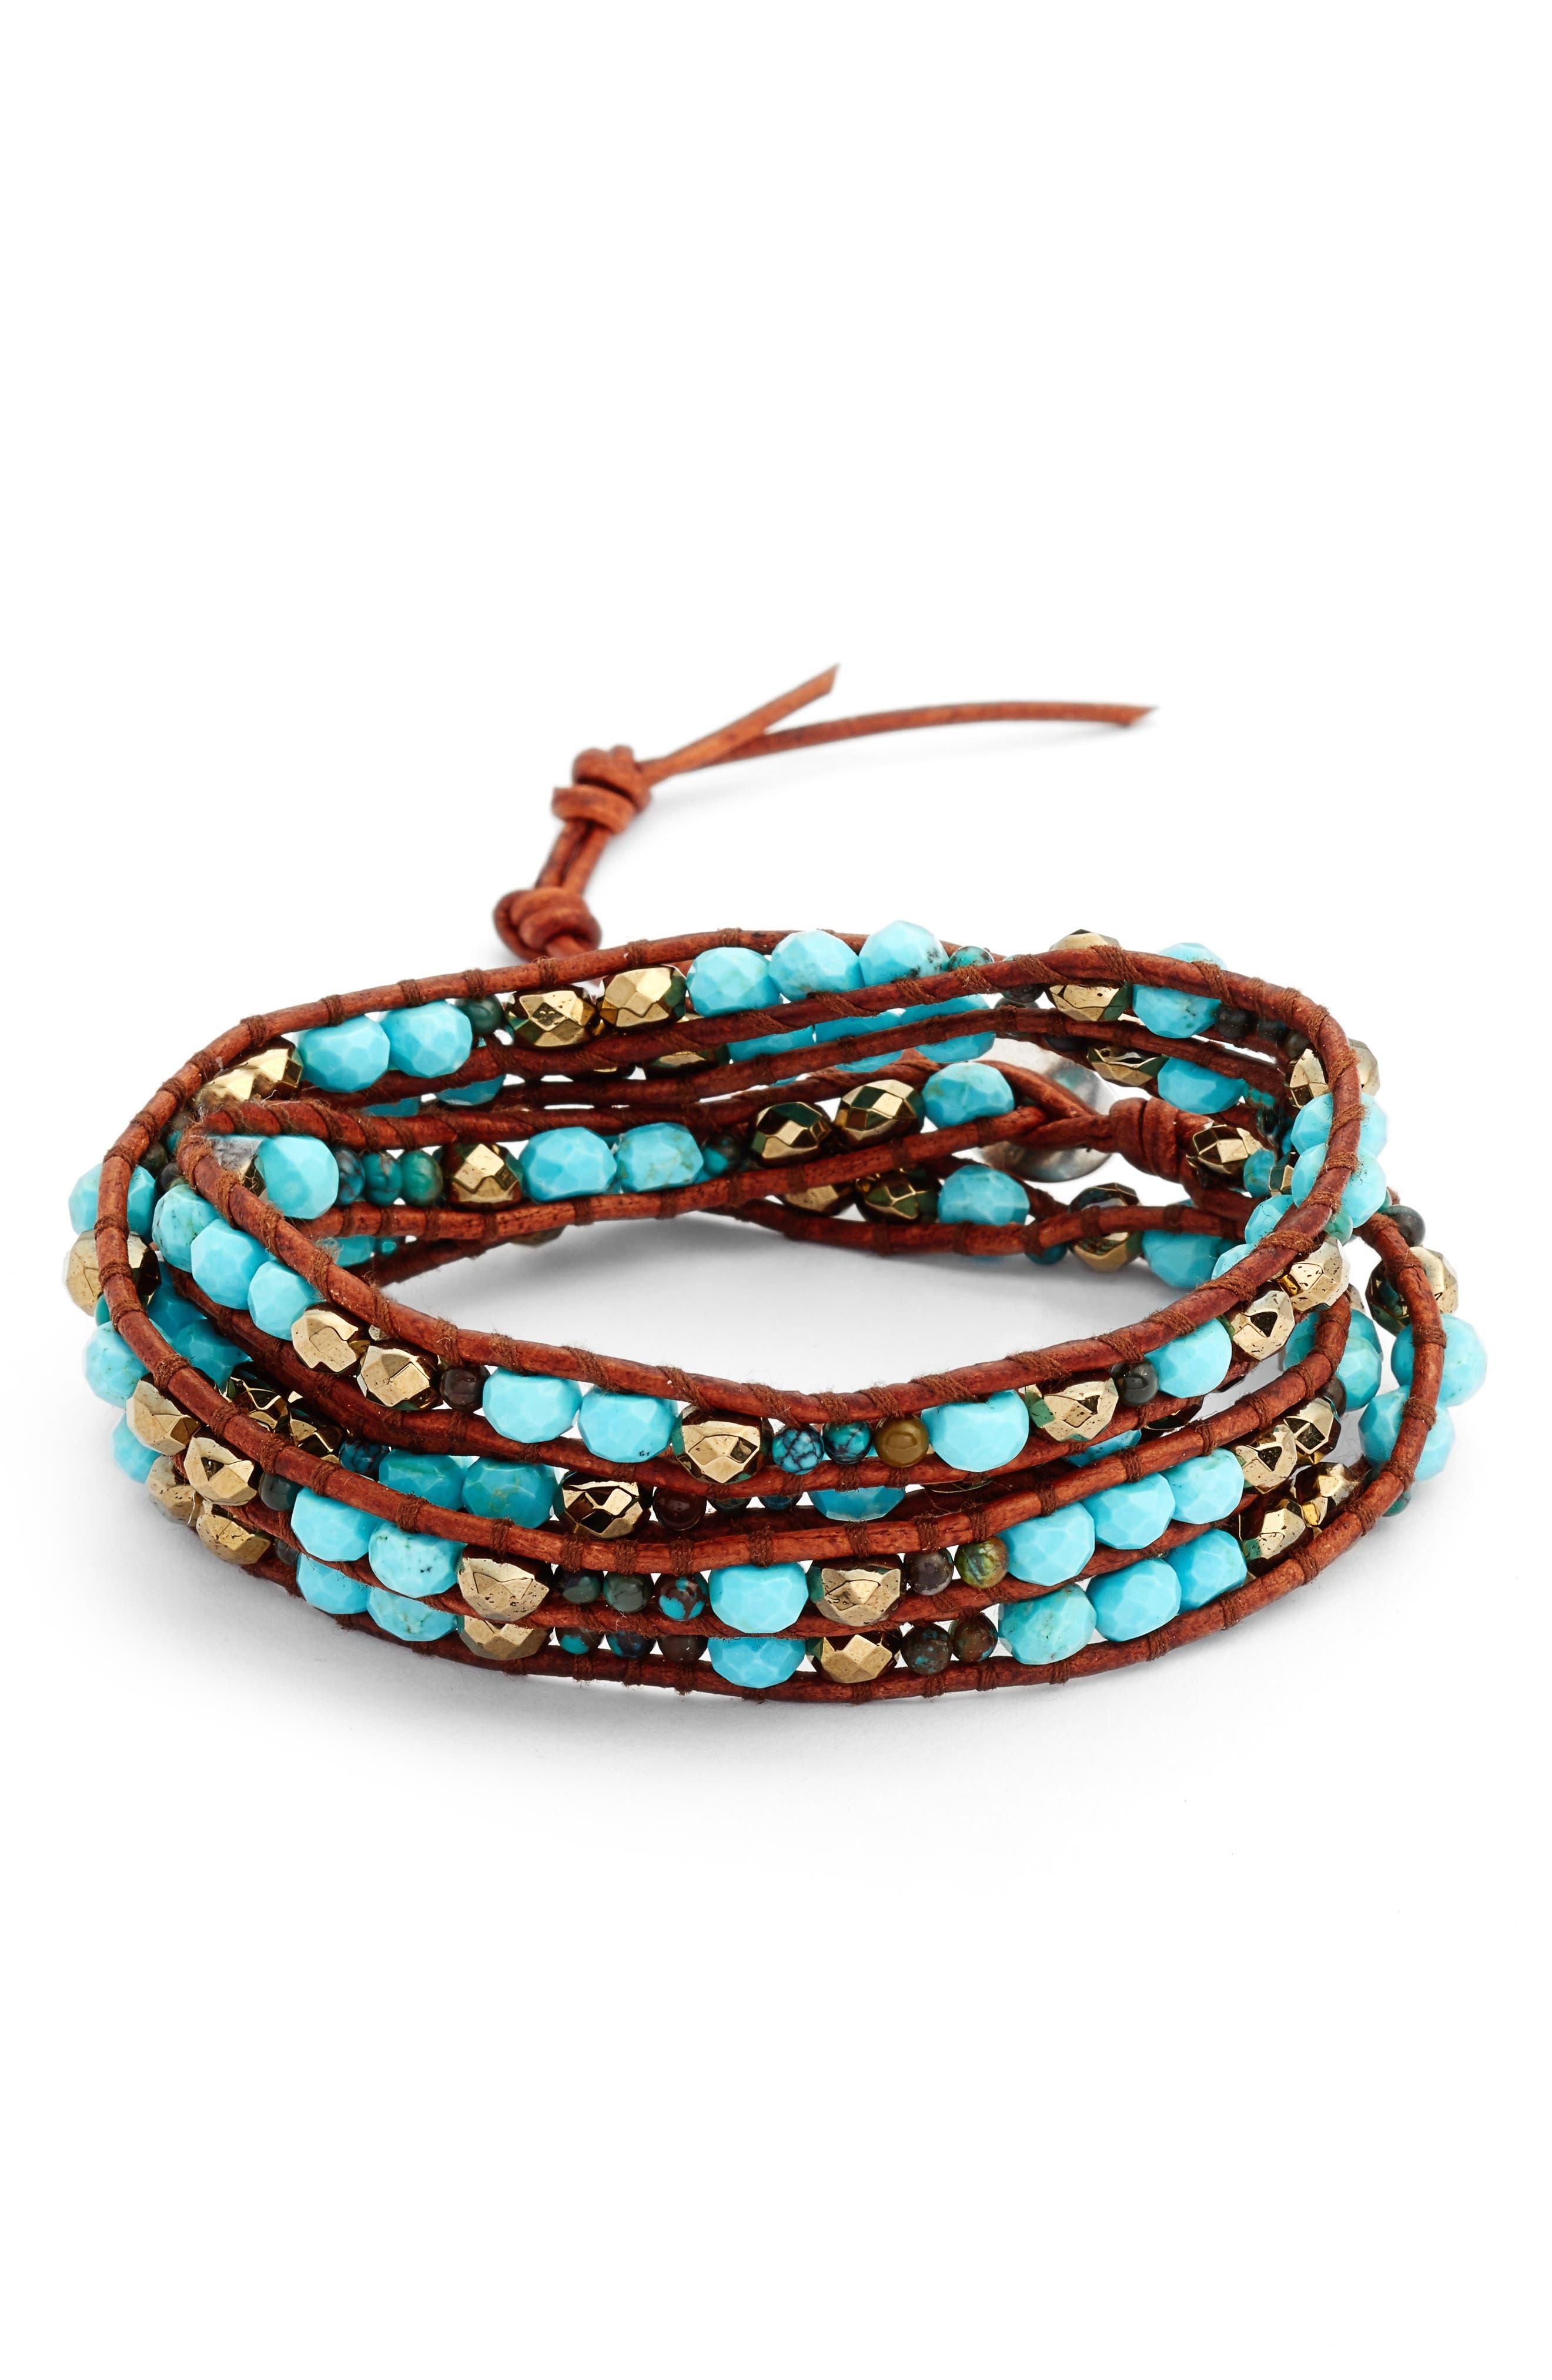 Mixed Semiprecious Stone Wrap Bracelet,                             Main thumbnail 1, color,                             Turquoise Mix